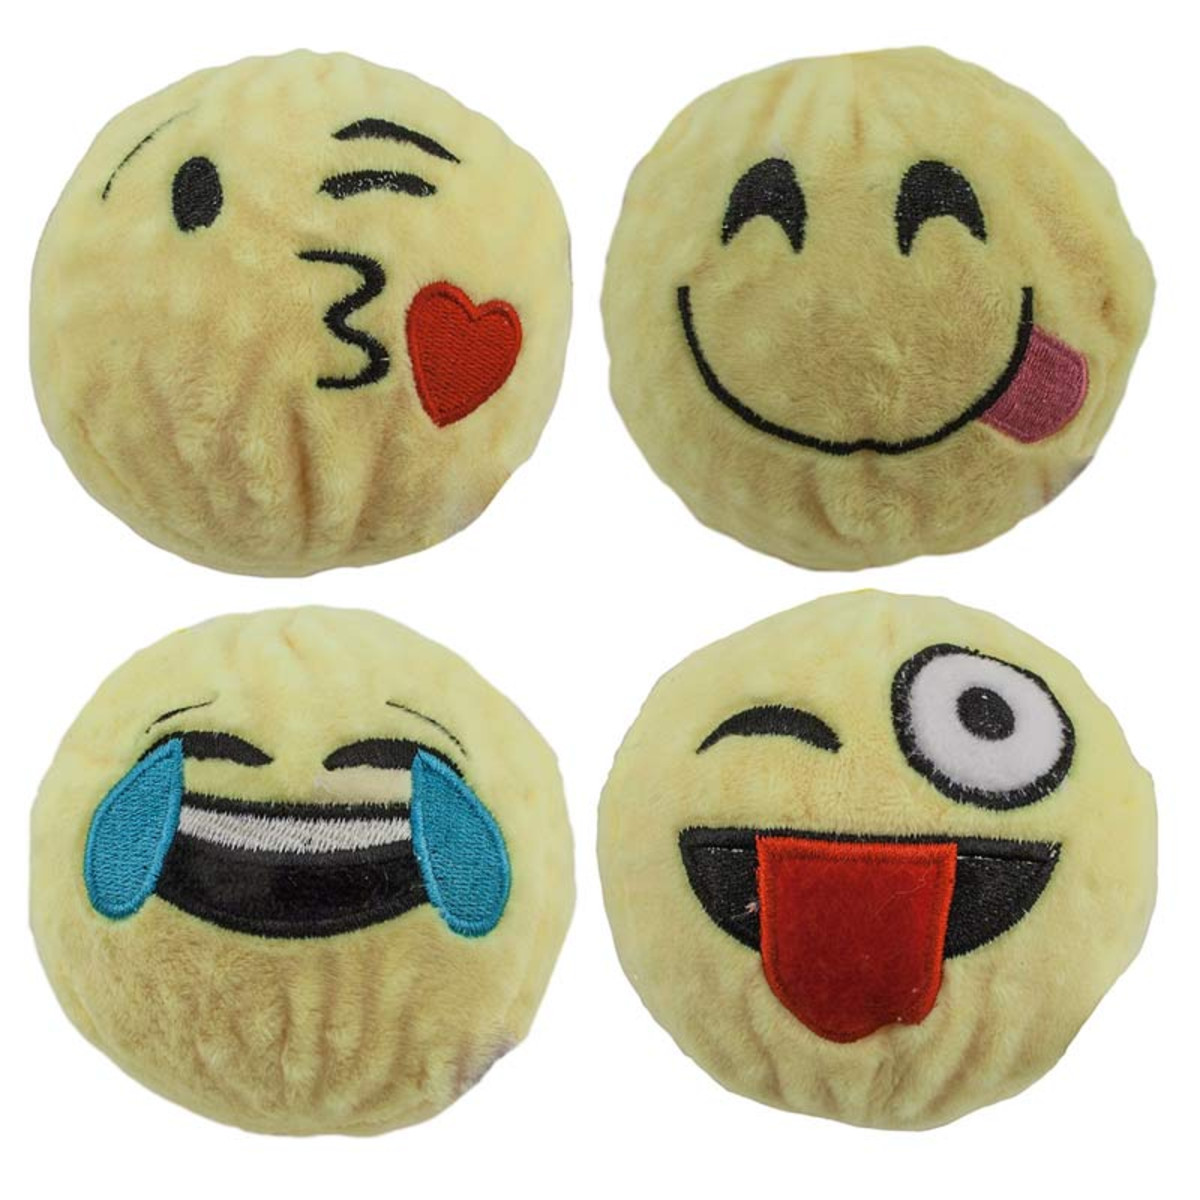 Dawgeee Toy EMOJI Ball 3 inch - Various emojis